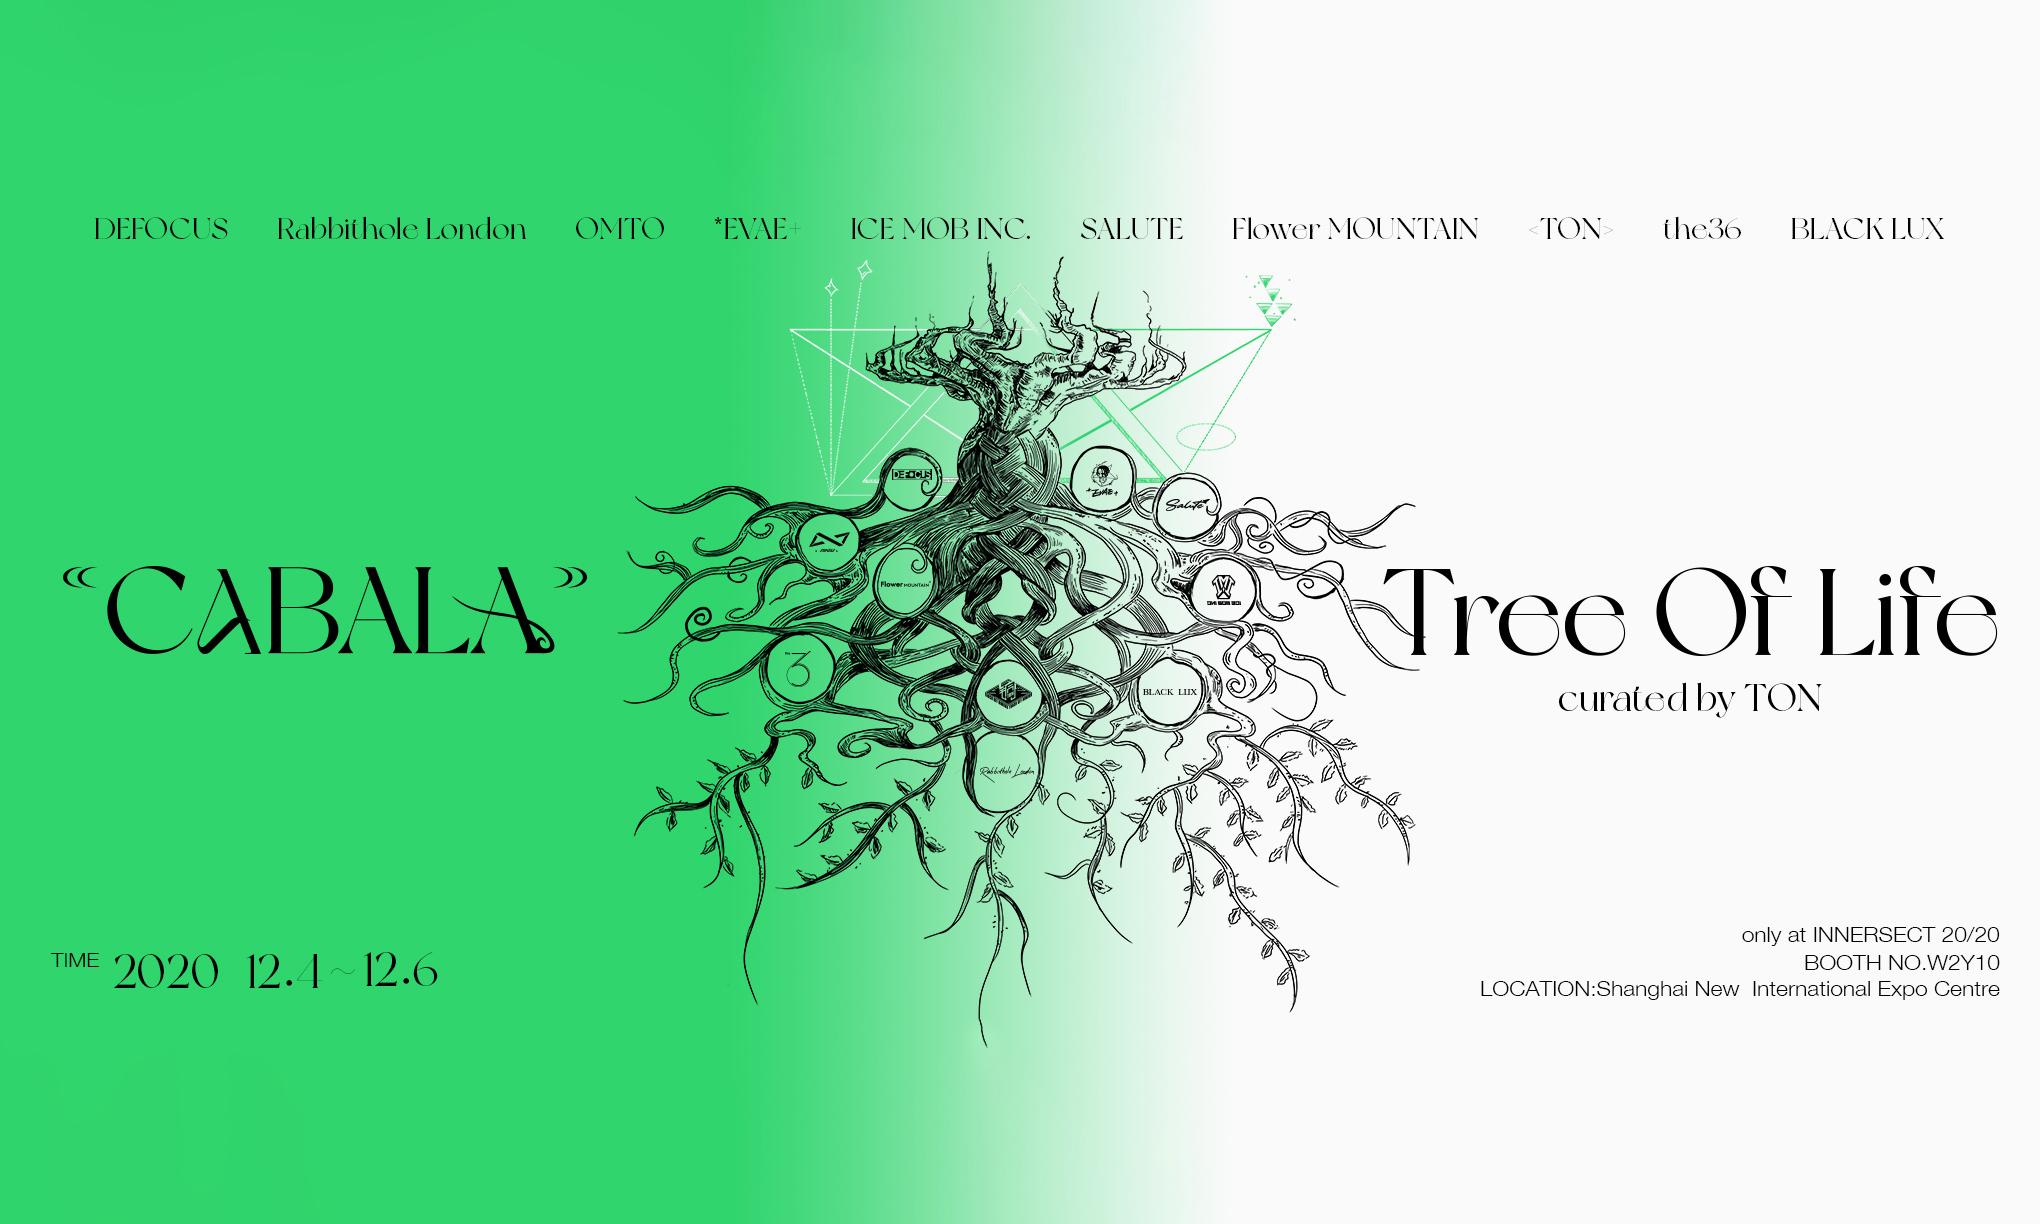 「CABALA—Tree of Life」生命之树特展即将登陆 INNERSECT